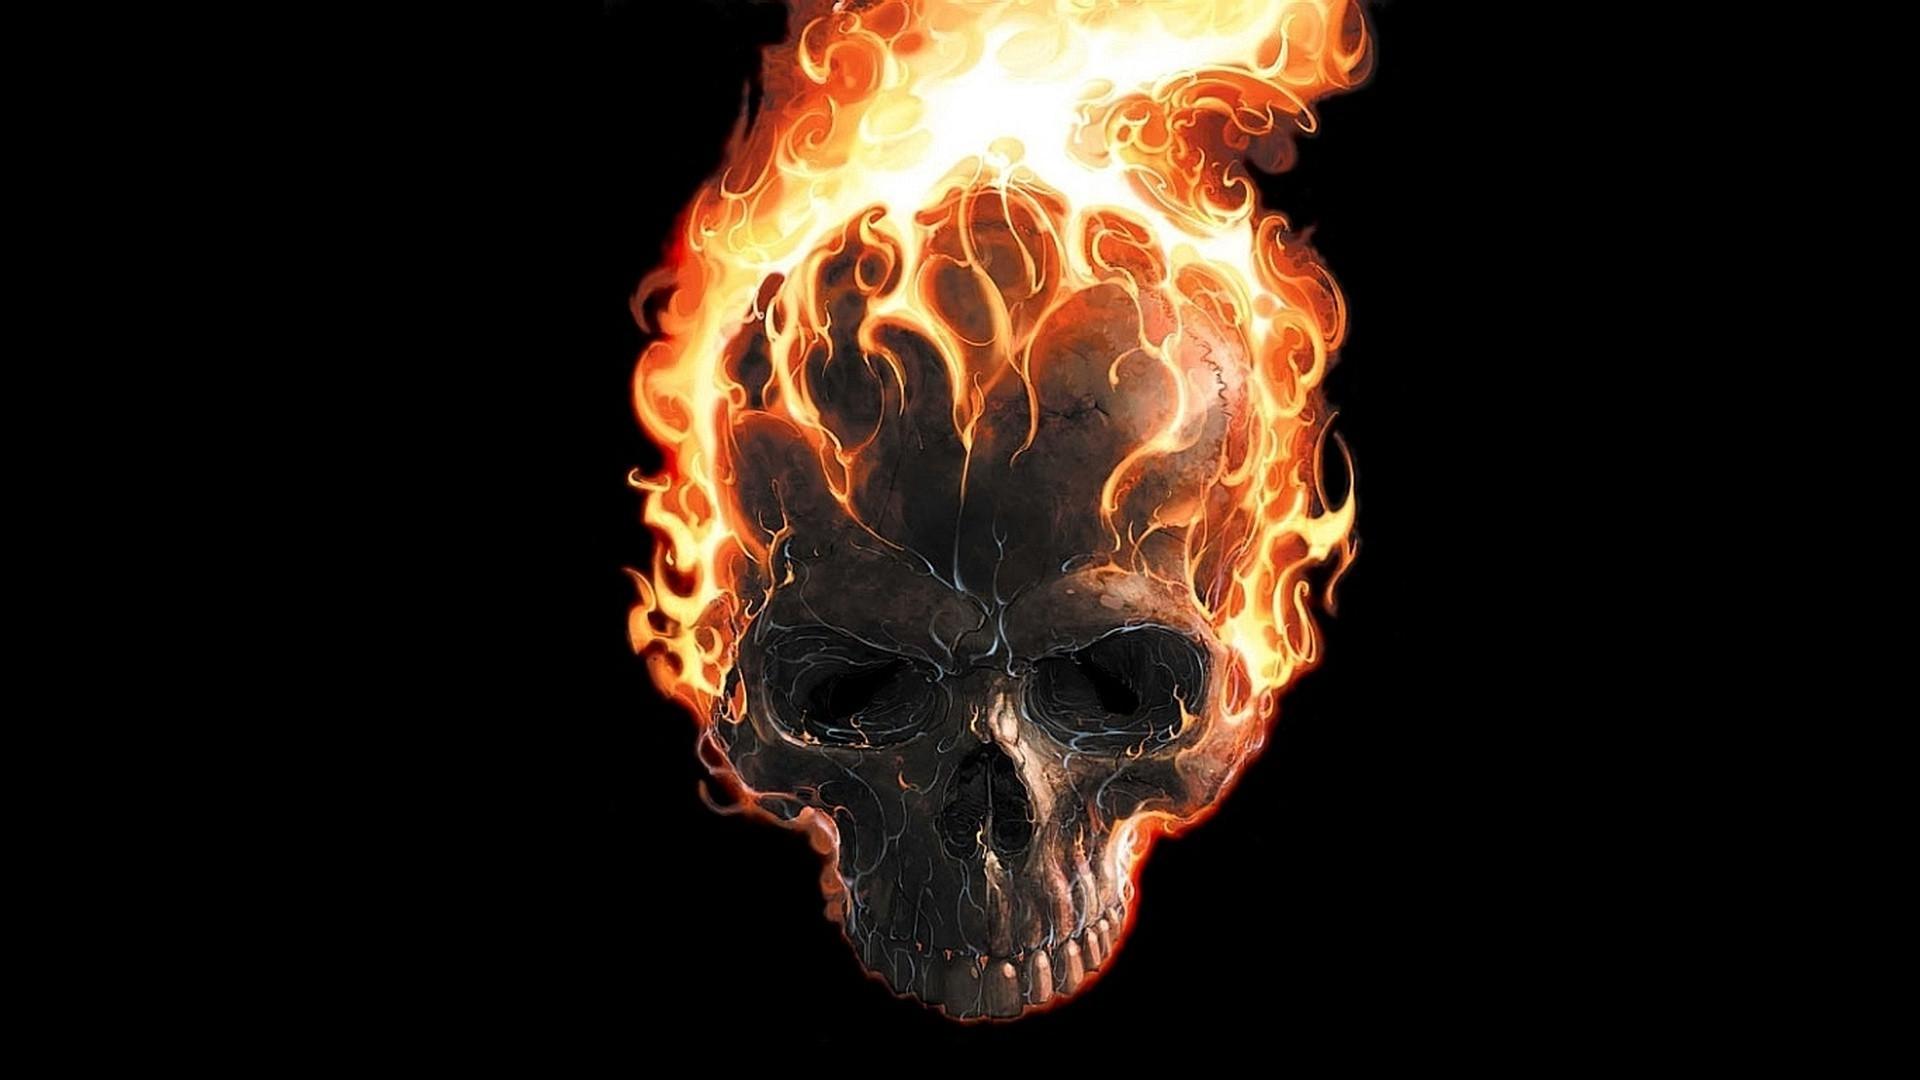 skull on fire wallpapers